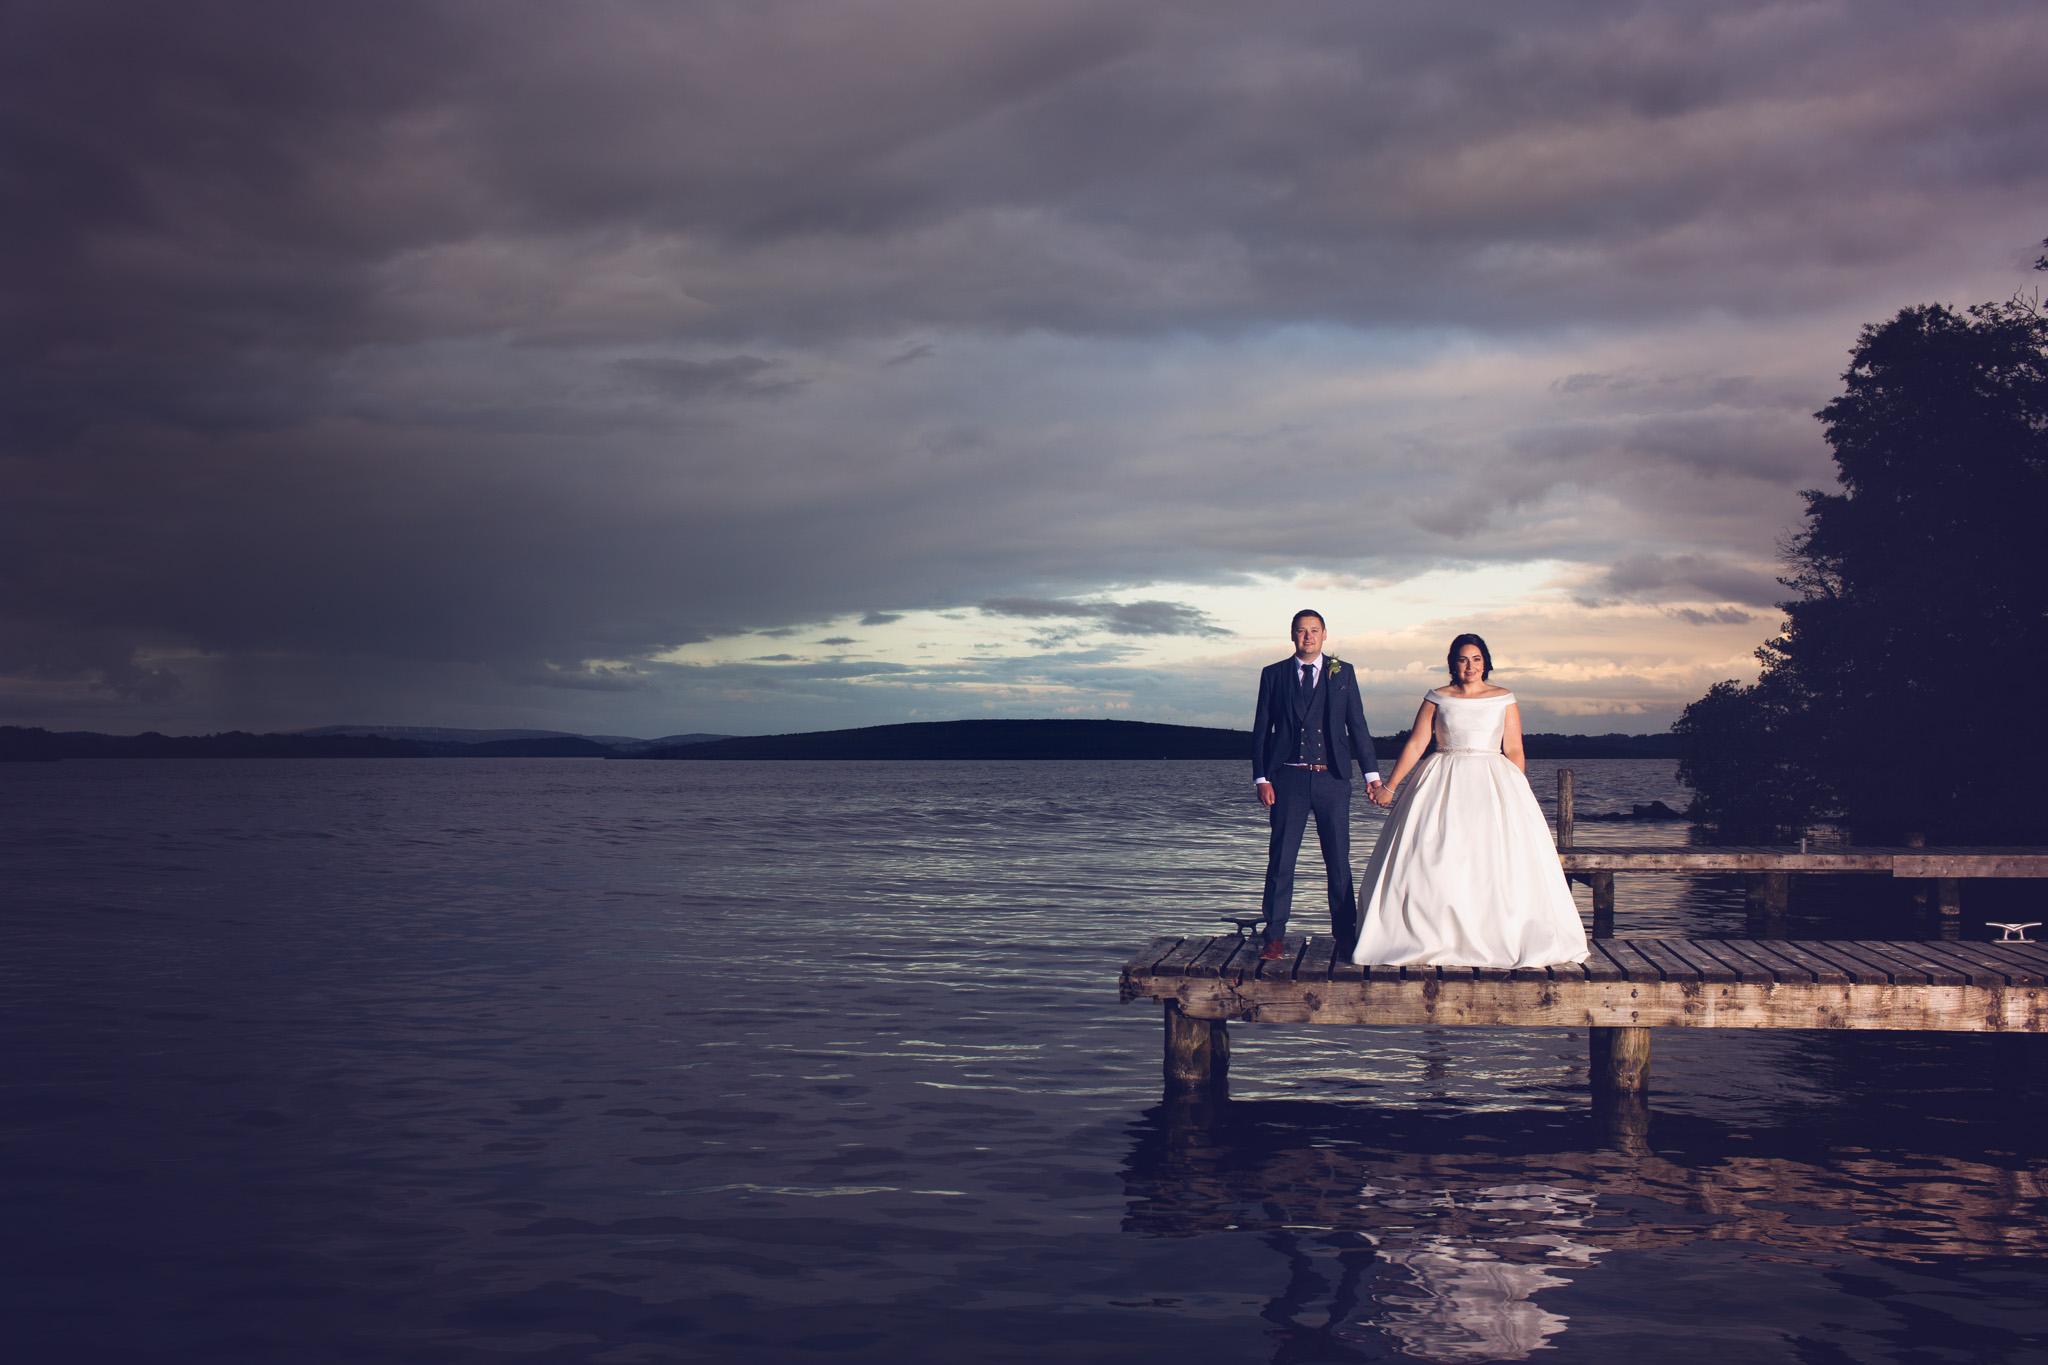 Mark_Barnes_Northern_Ireland_Wedding_Photography_Lusty_Beg_Wedding_Photography_Hayley&Brian-38.jpg